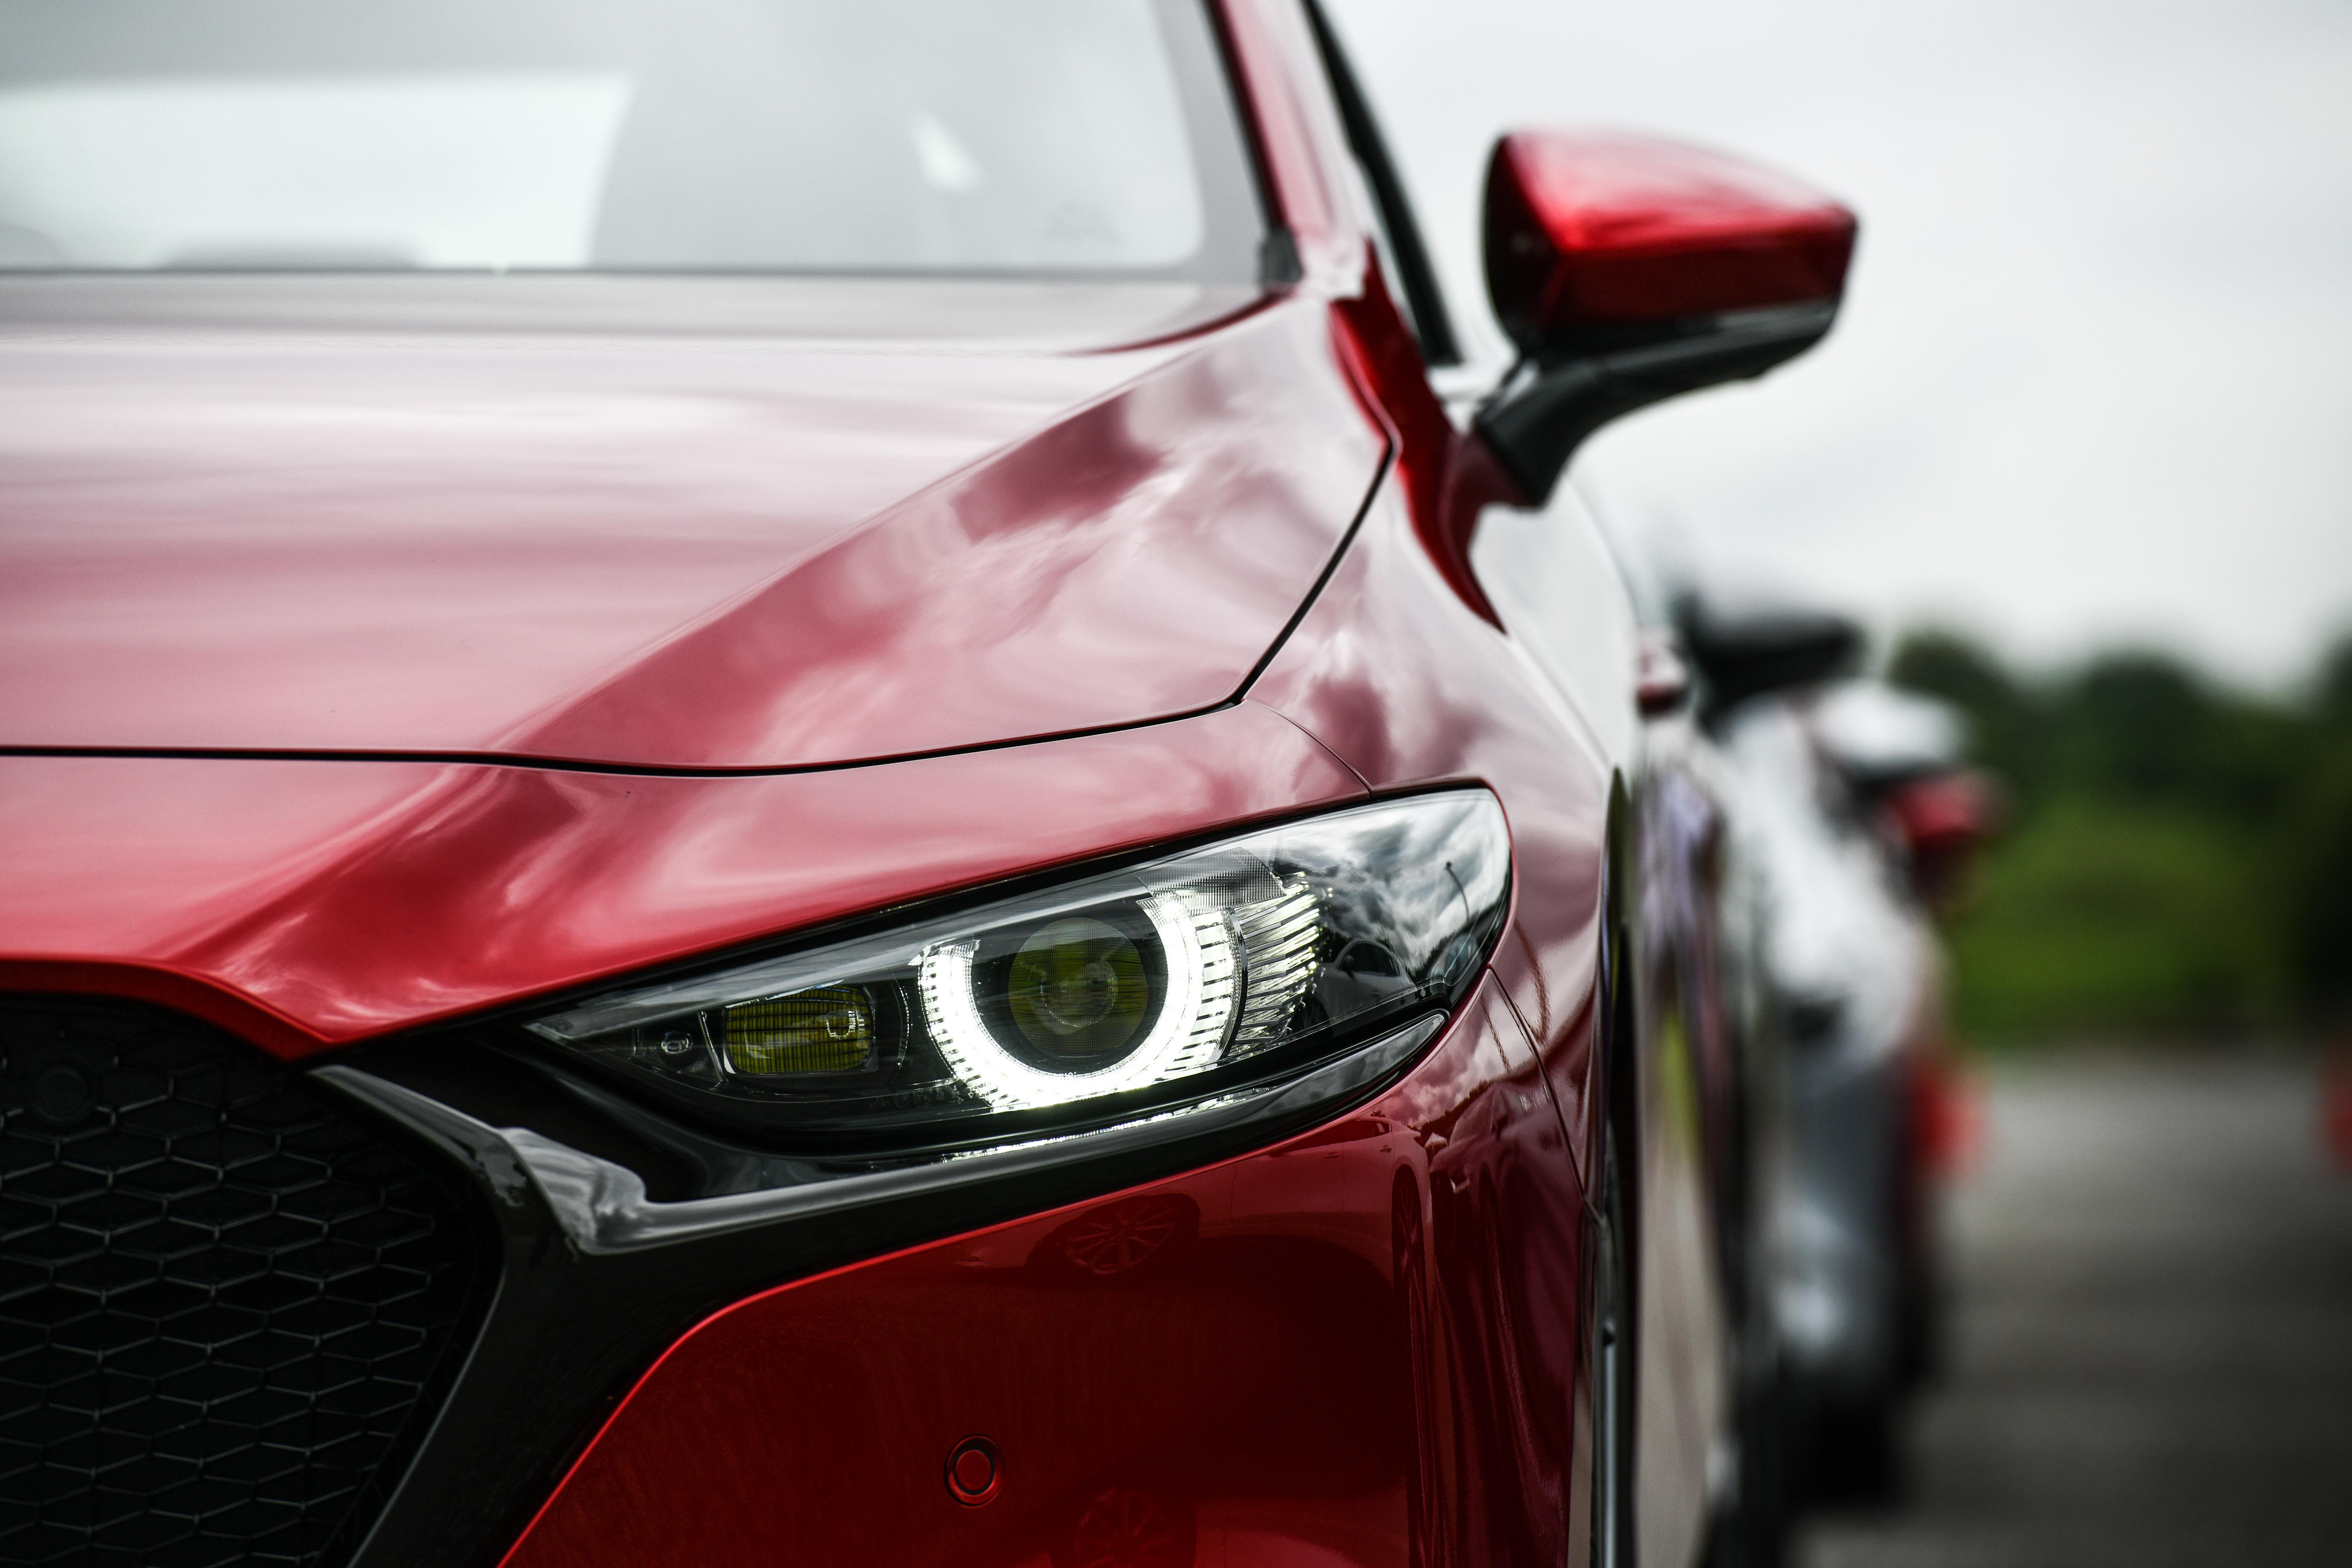 Mazda Thailand Sneak Preview ทดลองขับ All-New Mazda 3 ก่อนเปิดตัวอย่างเป็นทางการ